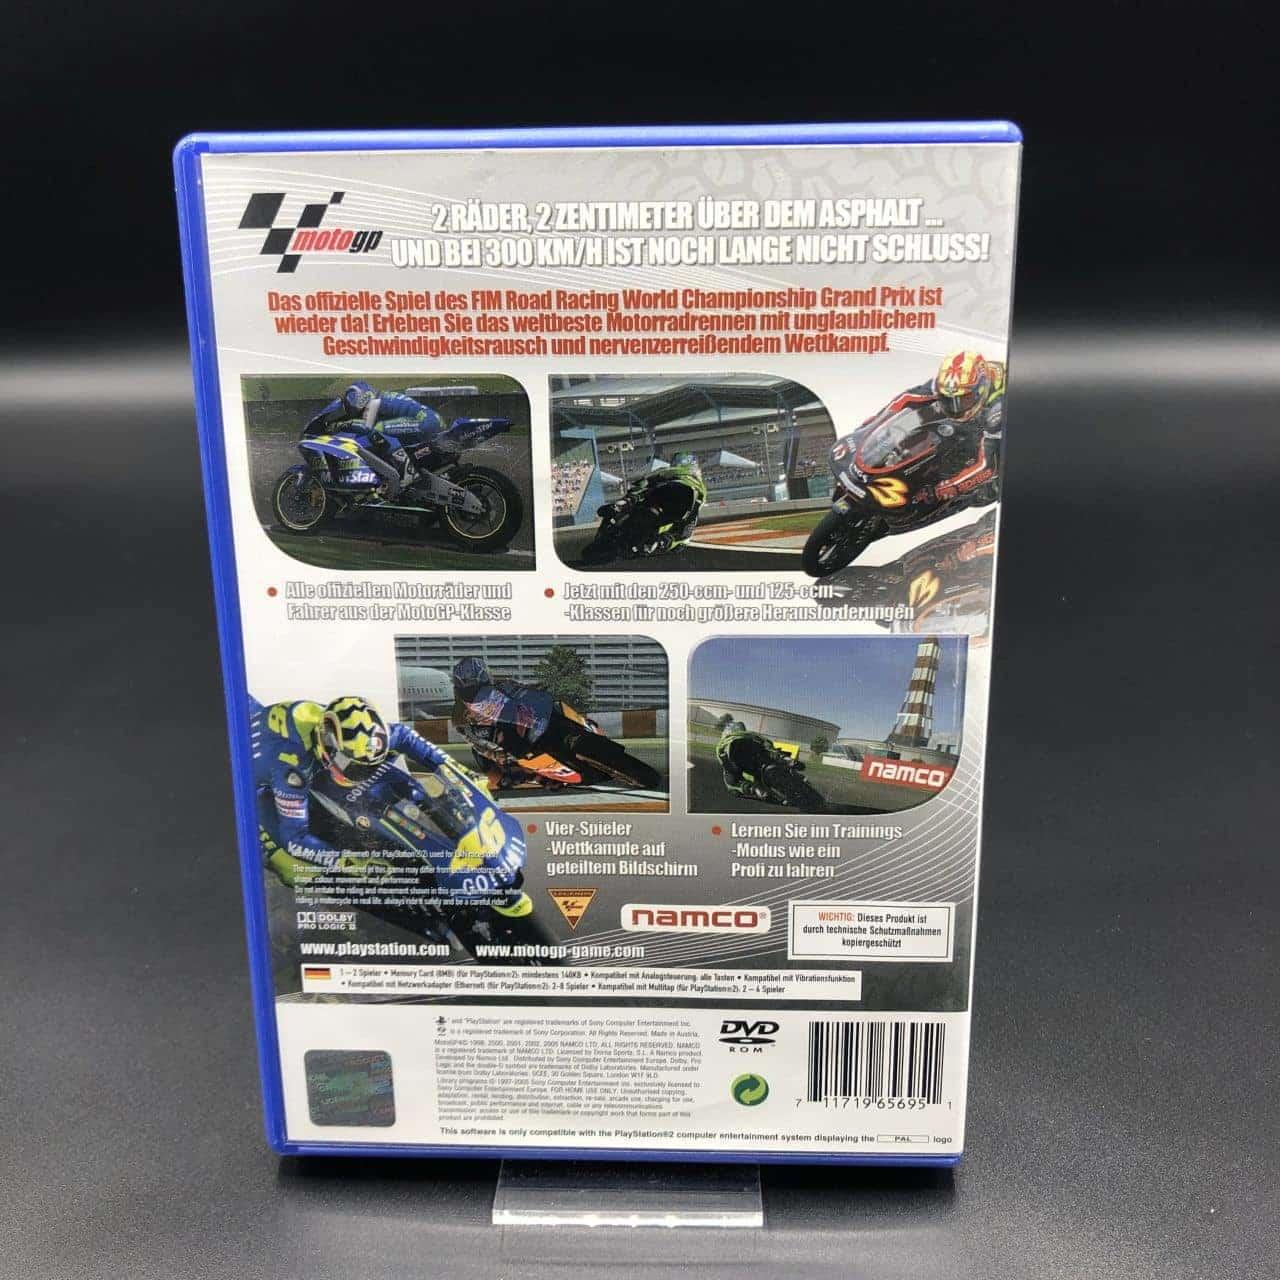 PS2 MotoGP 4 (Komplett) (Gebrauchsspuren) Sony PlayStation 2